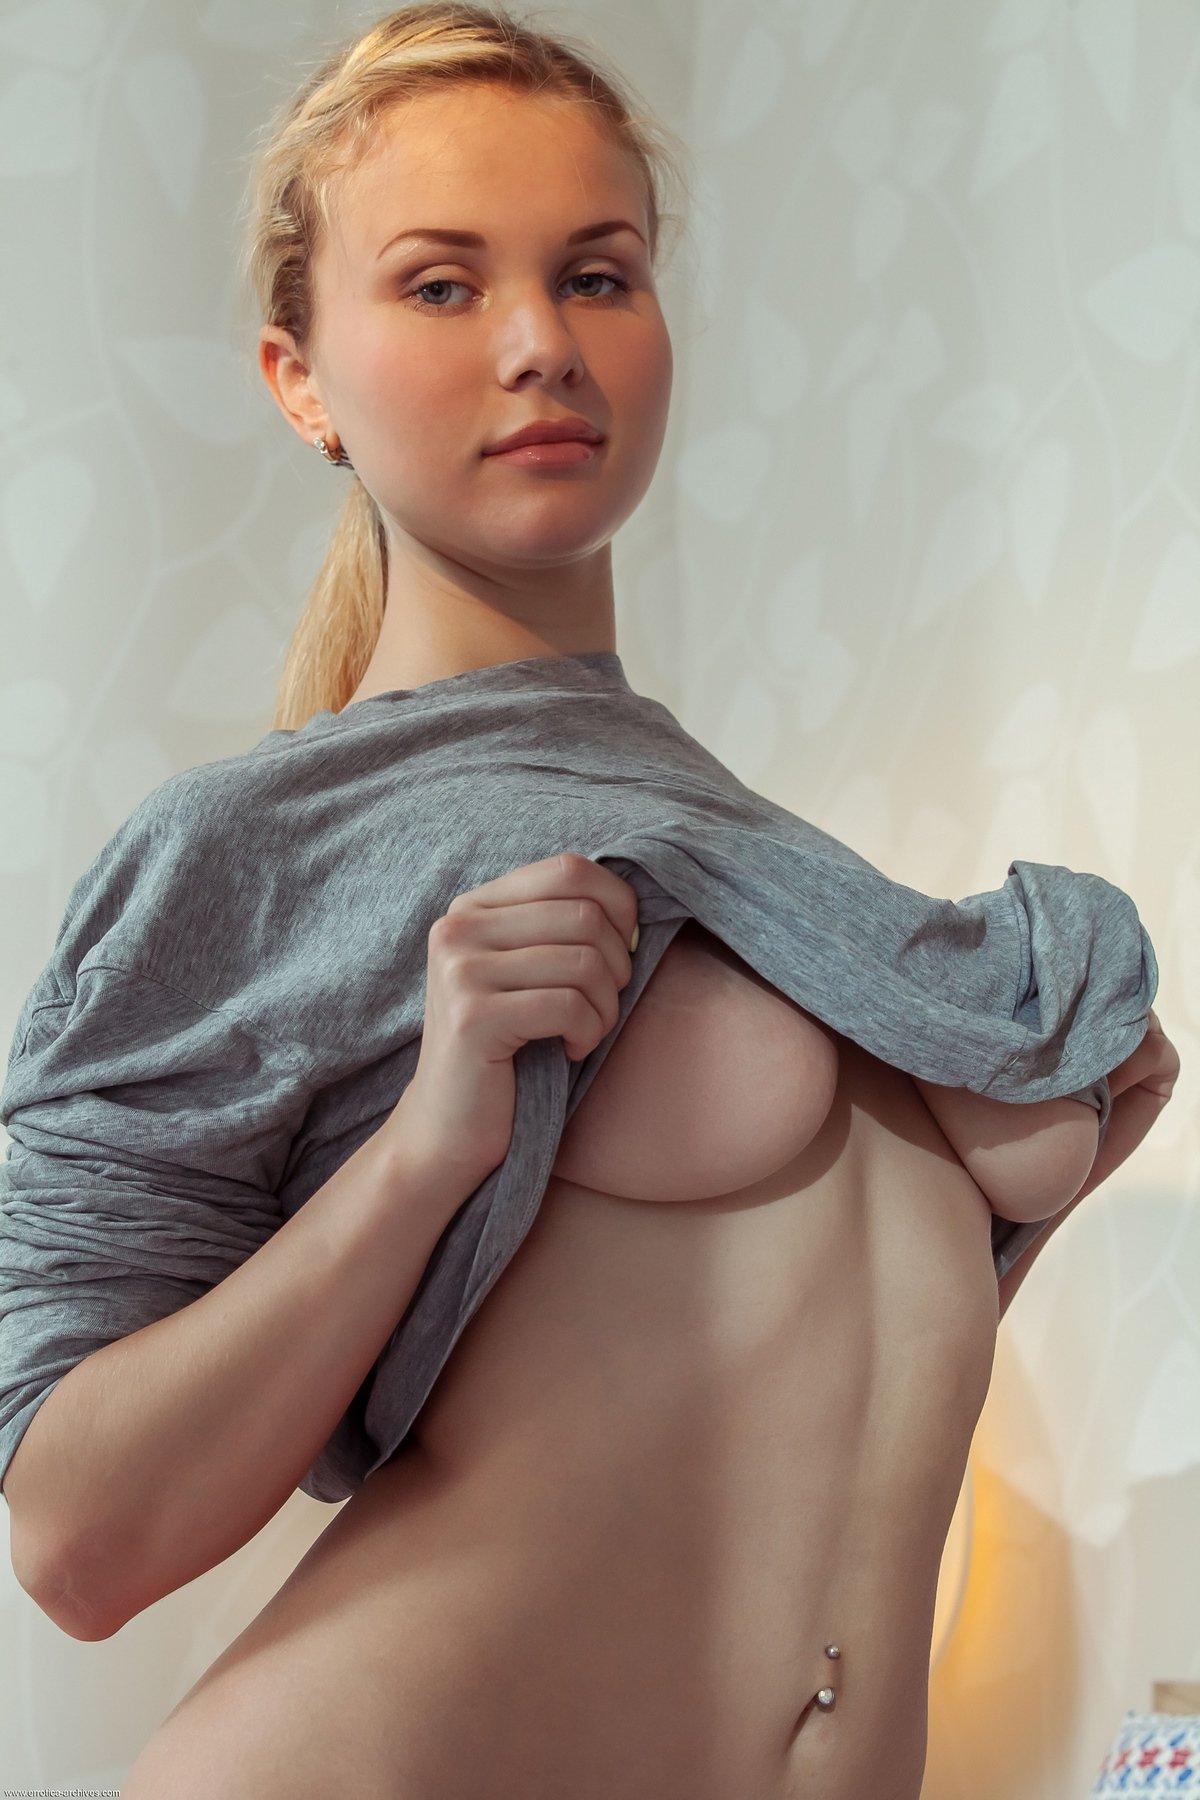 Красотка снимает футболку сидя на кровати